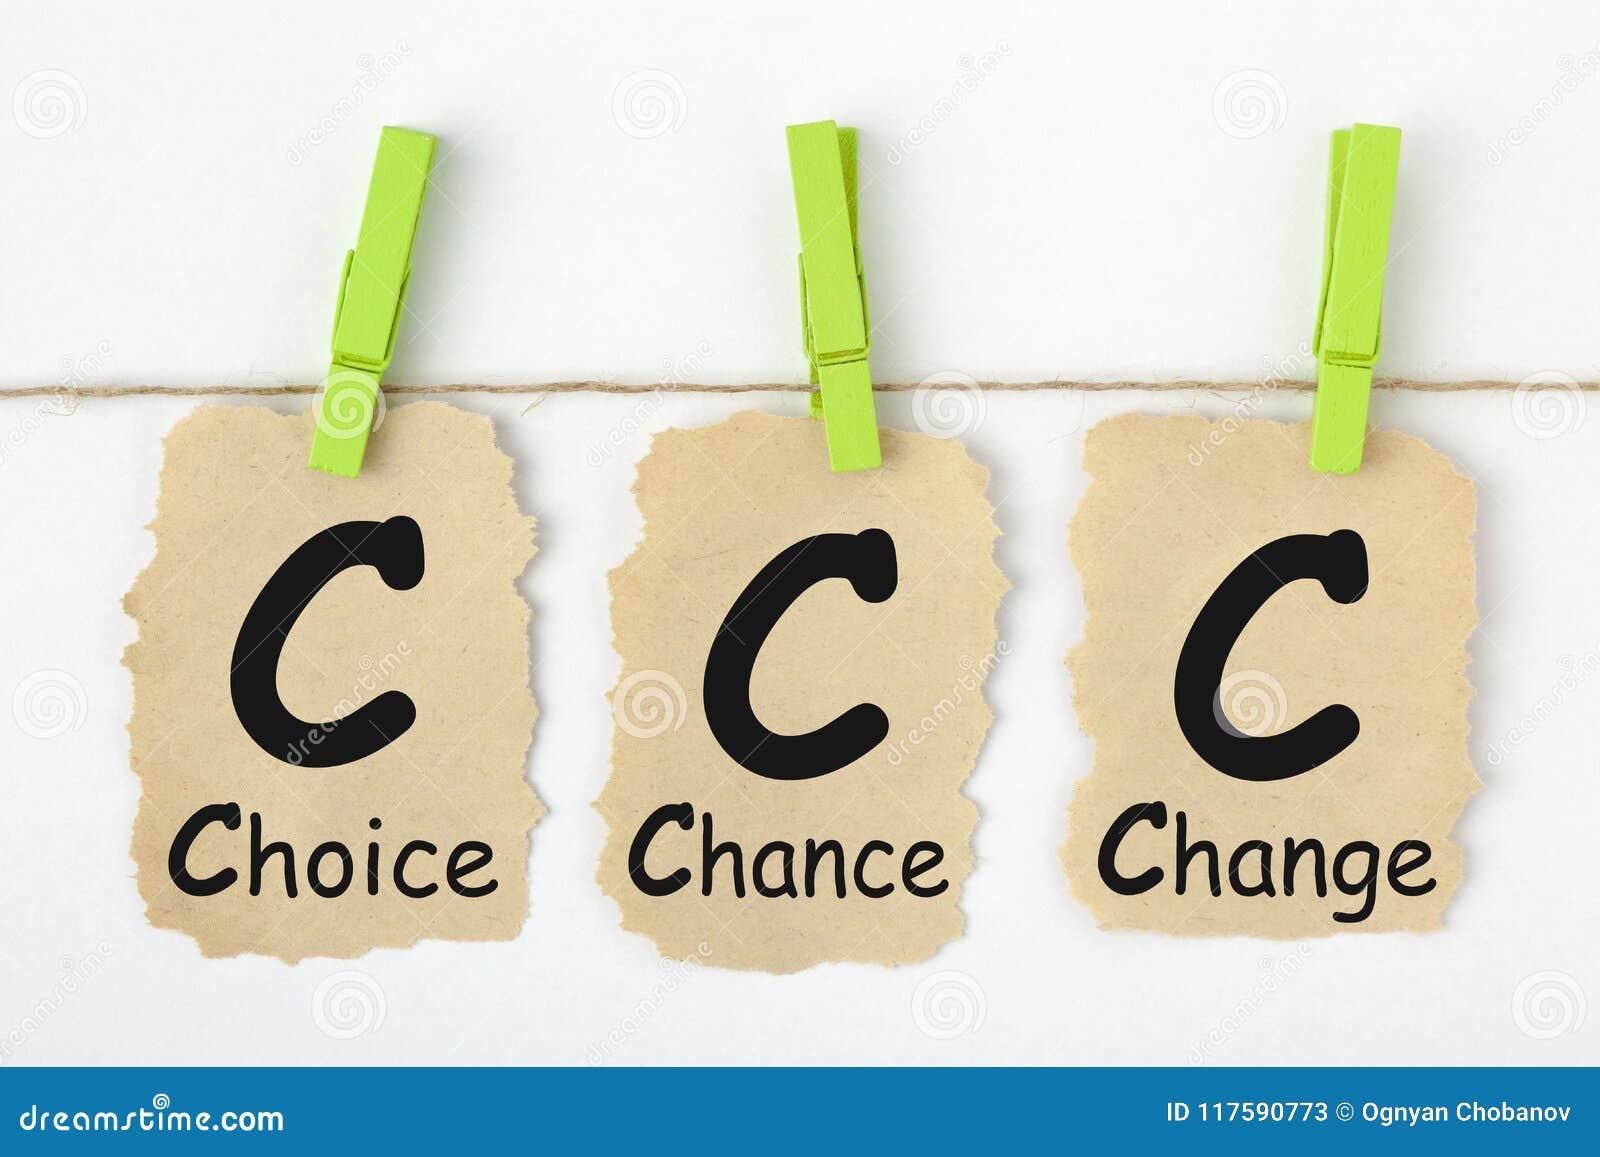 Choice Chance Change CCC